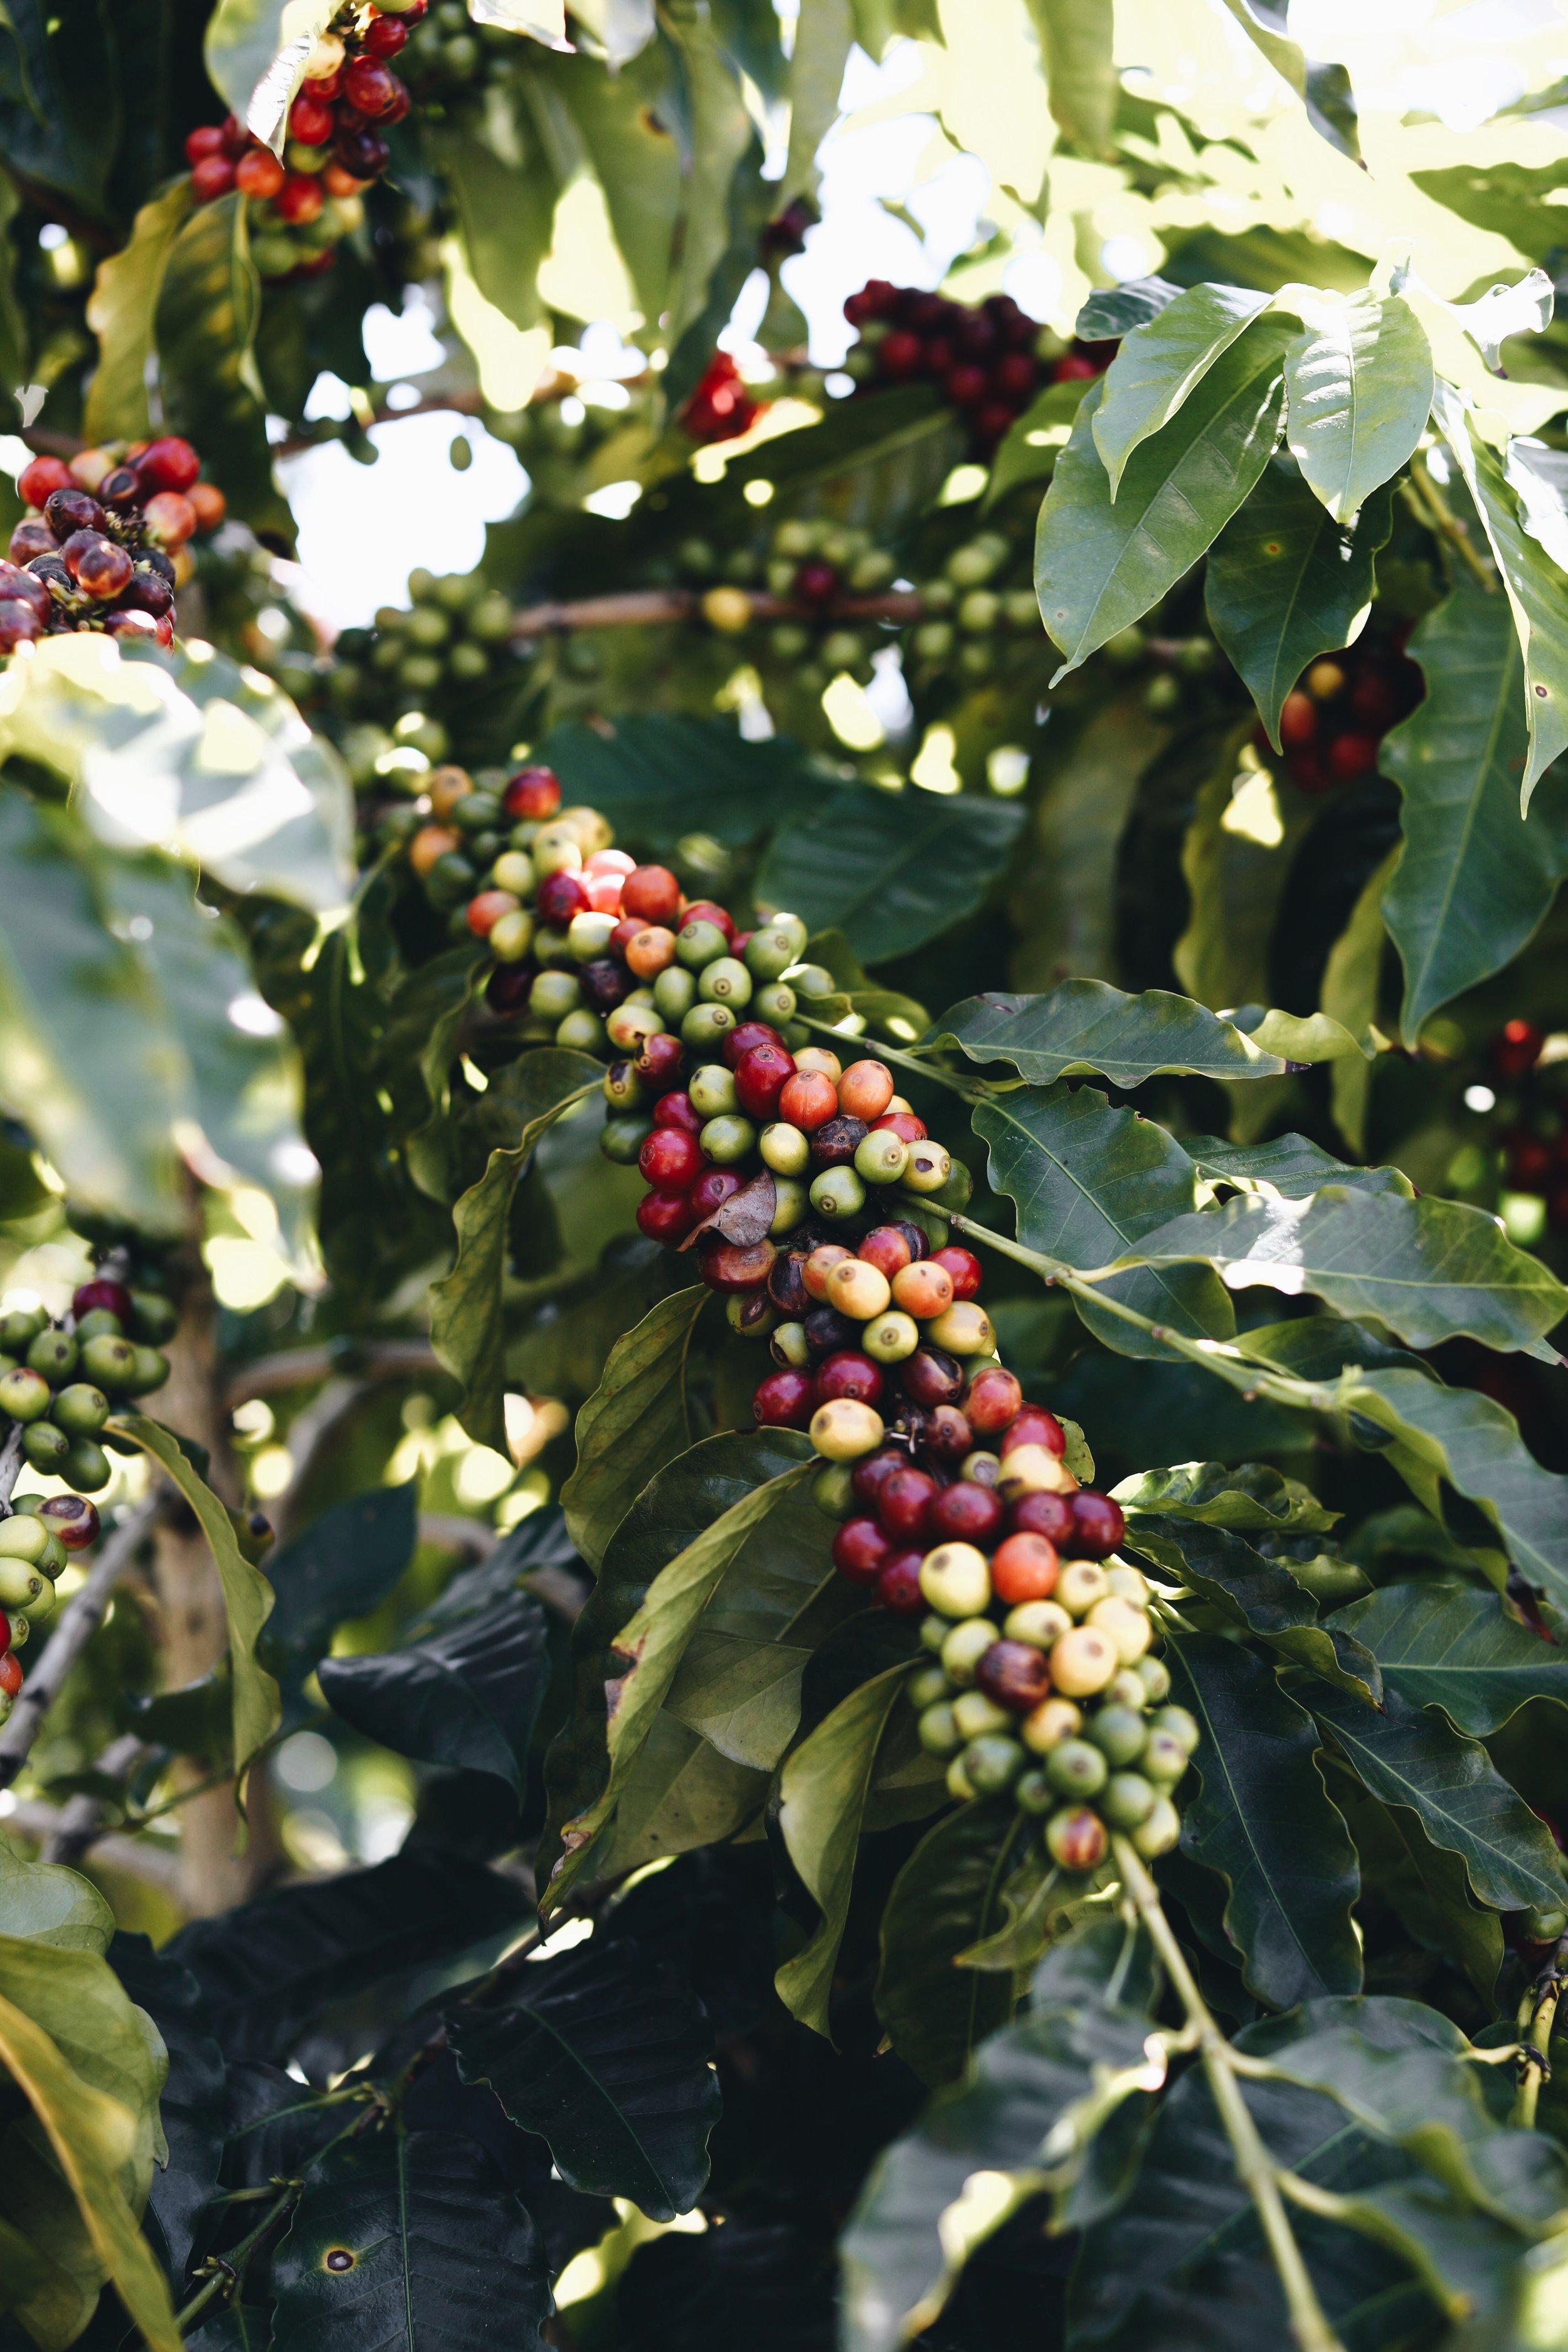 this is a coffee tree, seen at kula beans' farm in maui, hawai'i